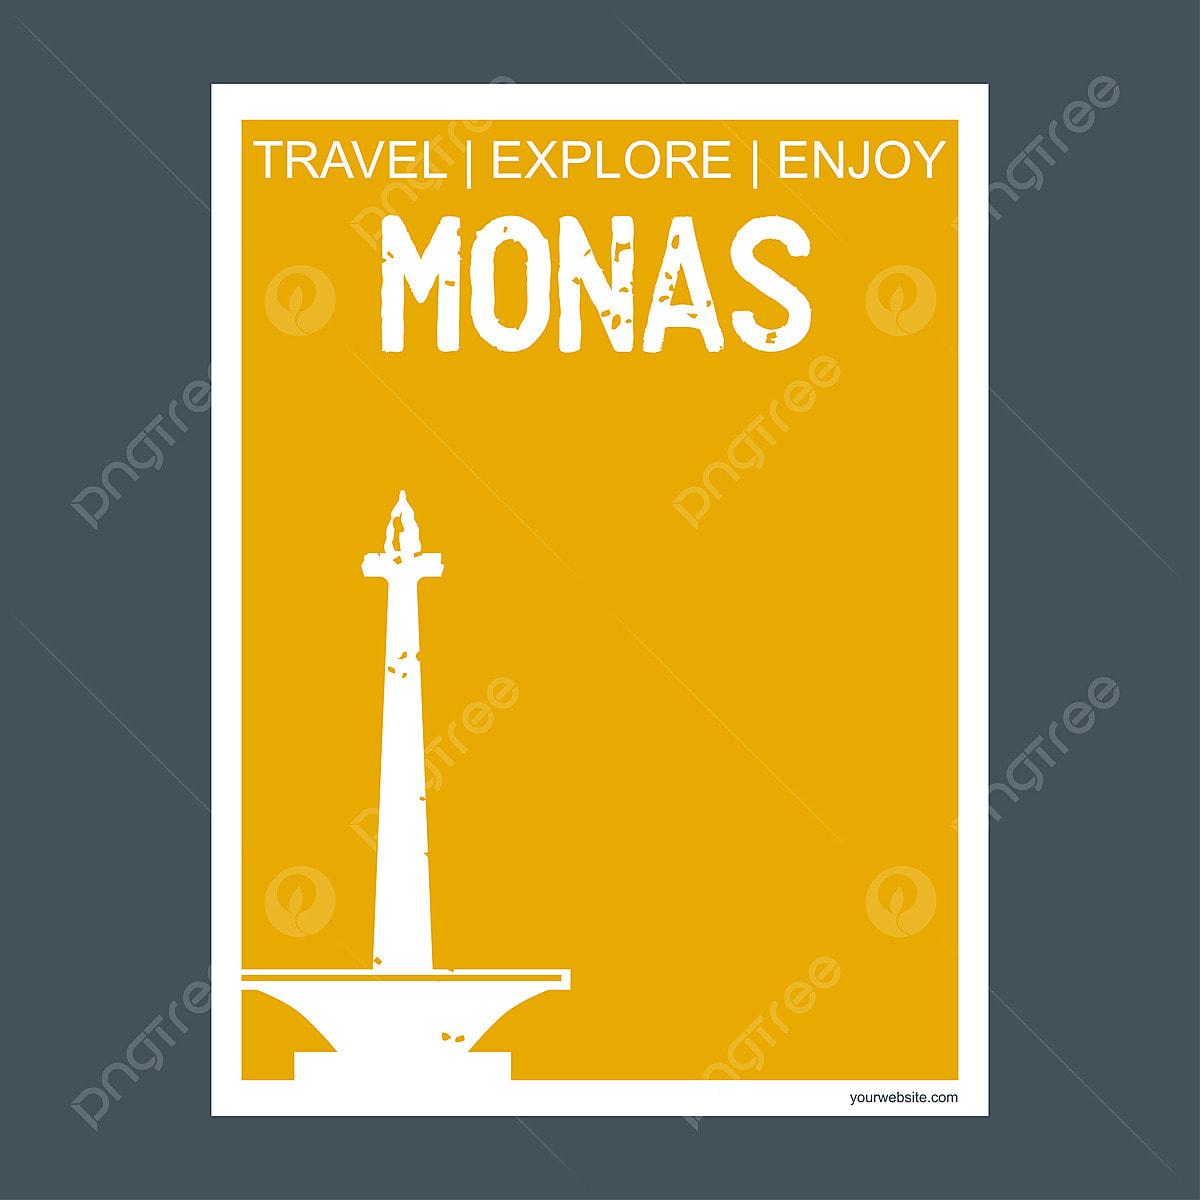 Download 6300 Background Foto Monas HD Gratis